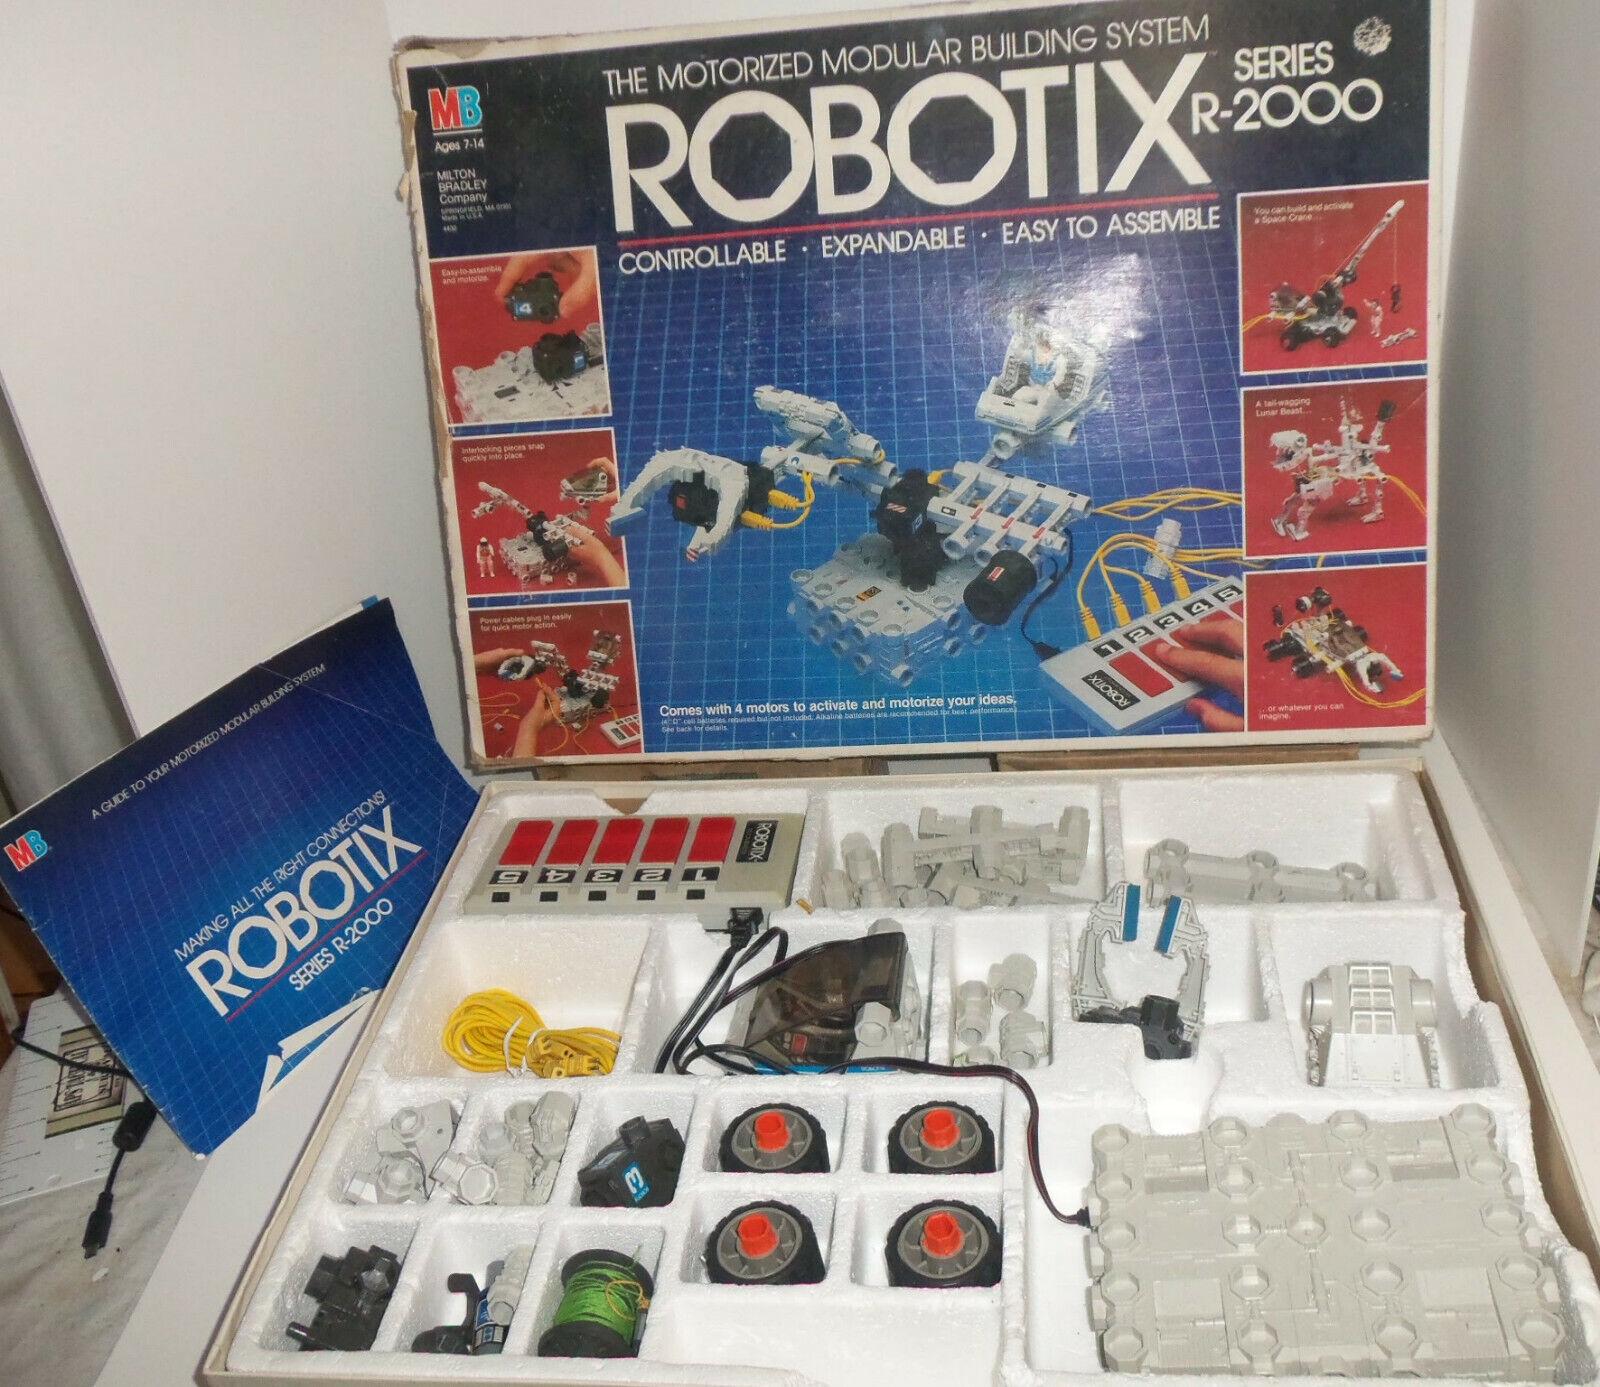 Robotix R-2000 Series Milton Bradley Argus Robot Motorized Building System  1985